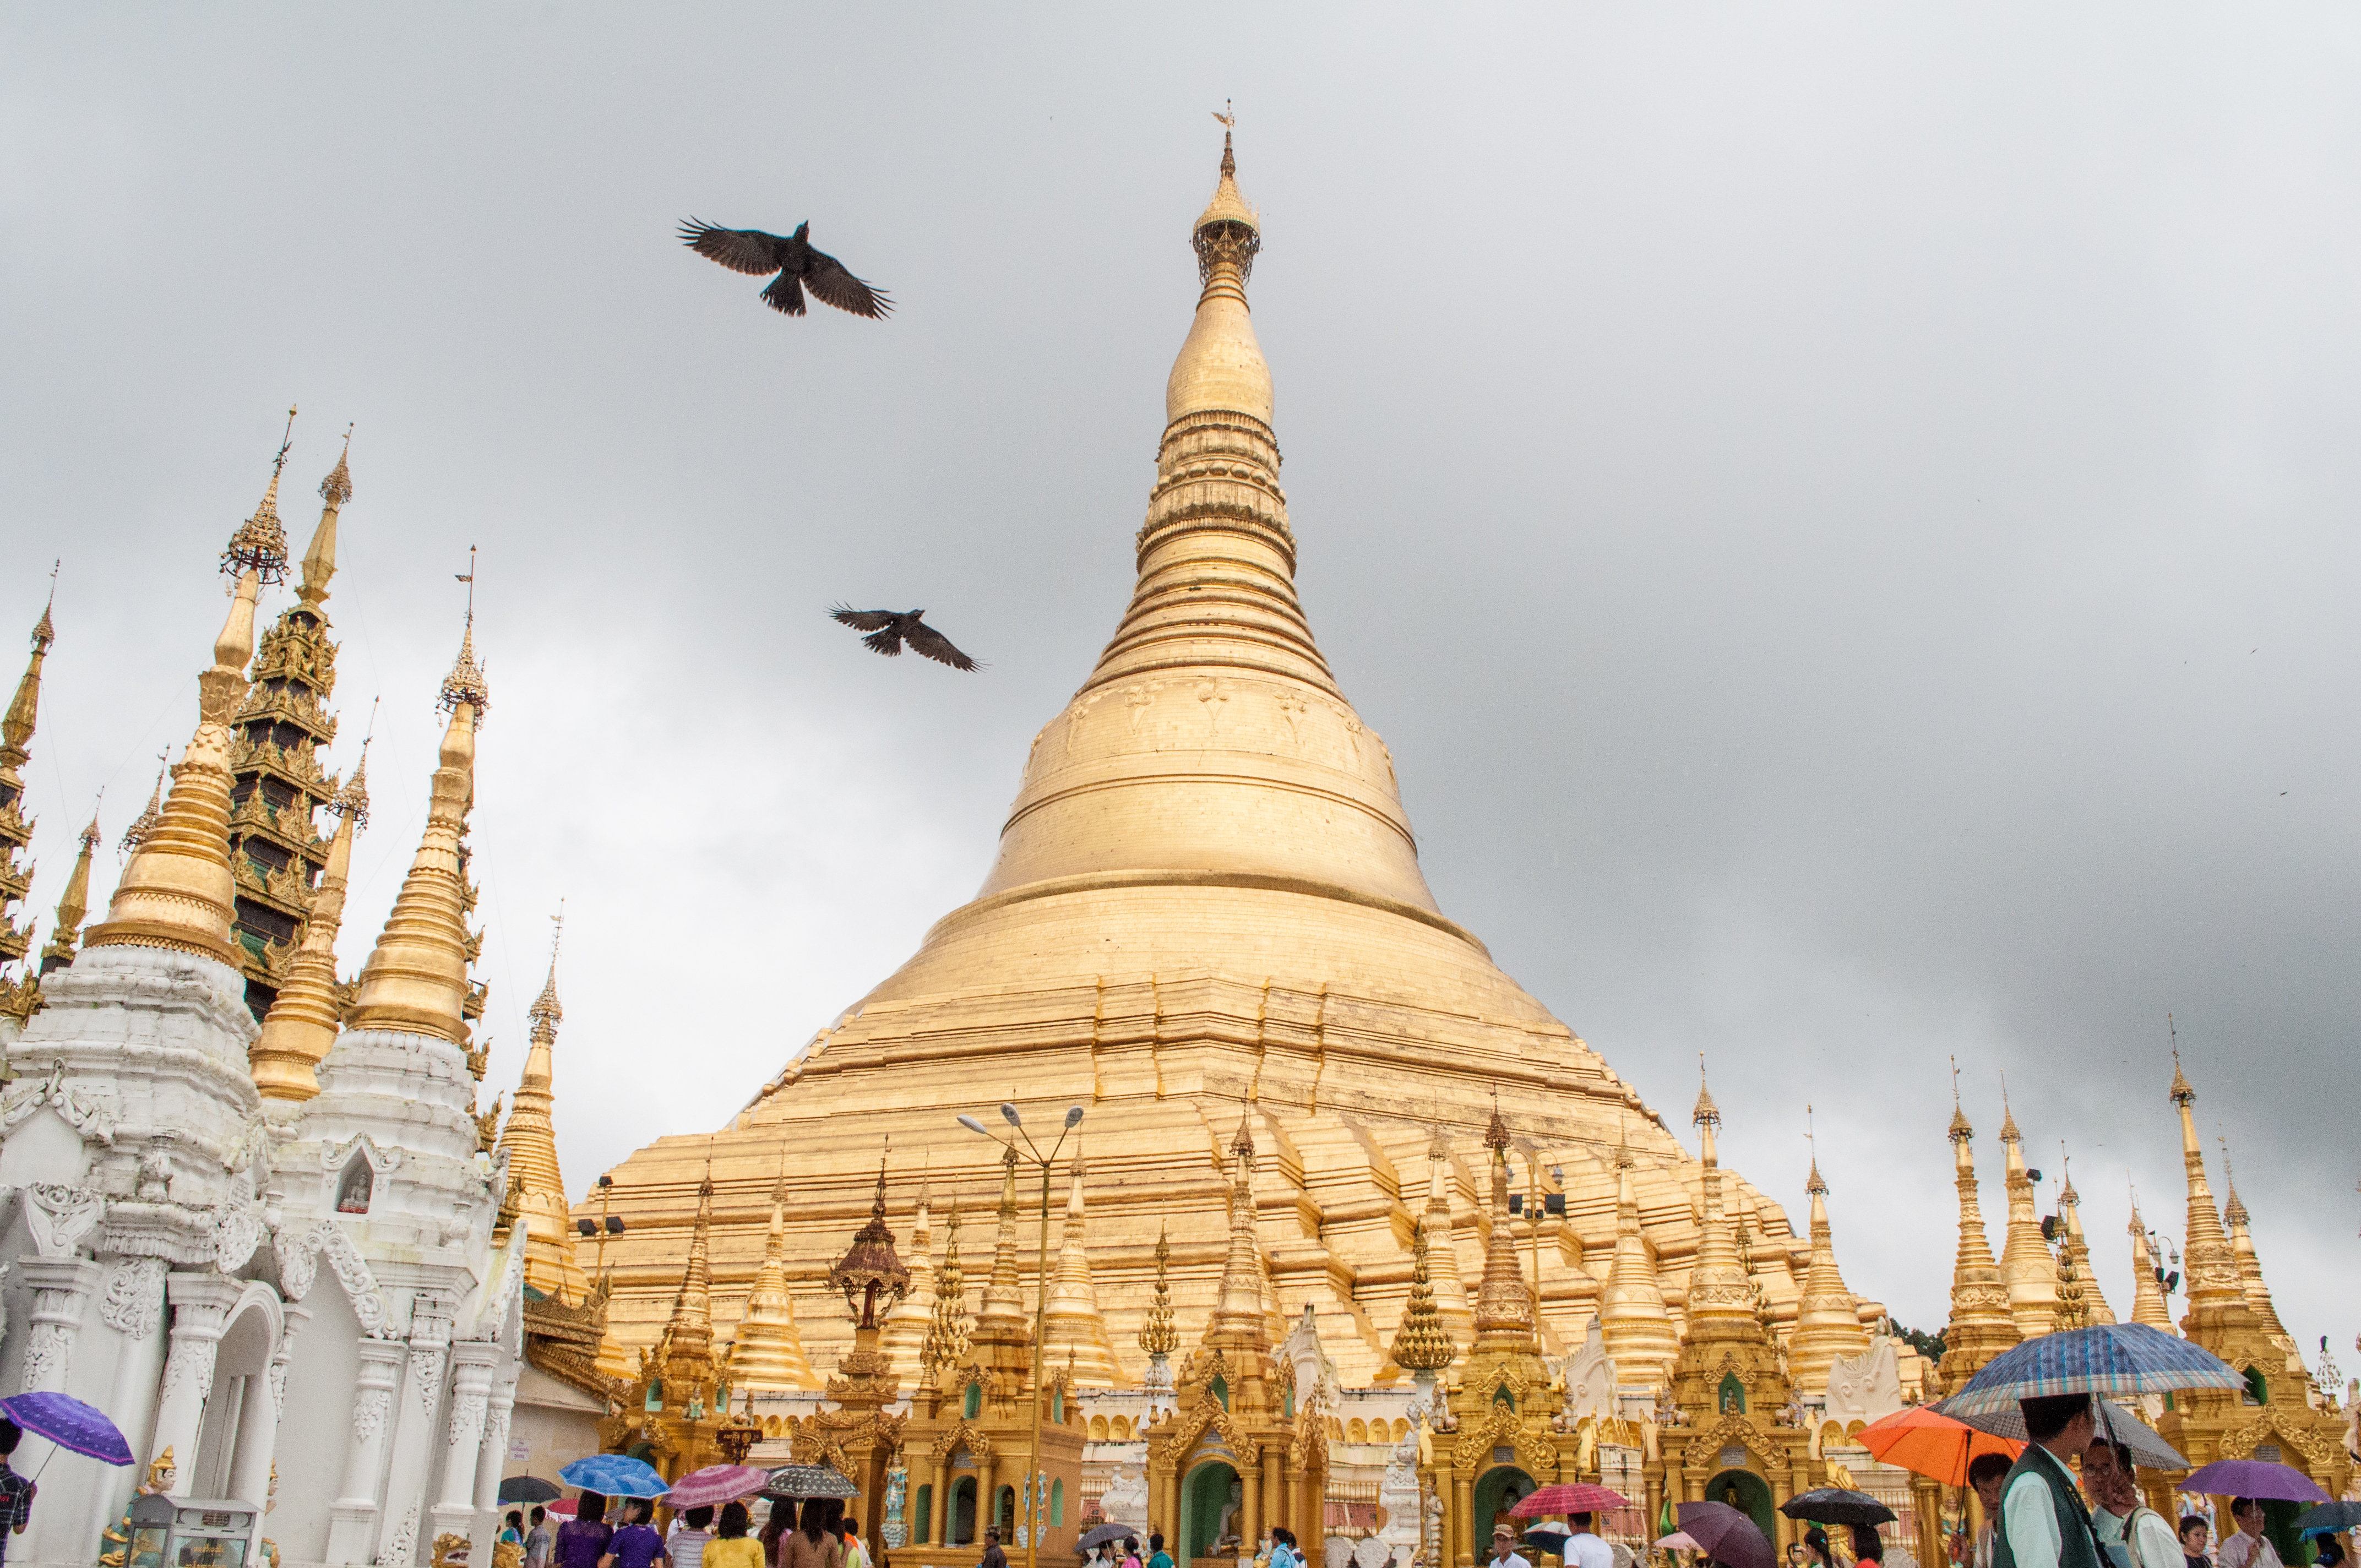 Towards Yangon Urban Growth Analytics / การวิเคราะห์การเจริญเติบโตของเมืองย่างกุ้ง